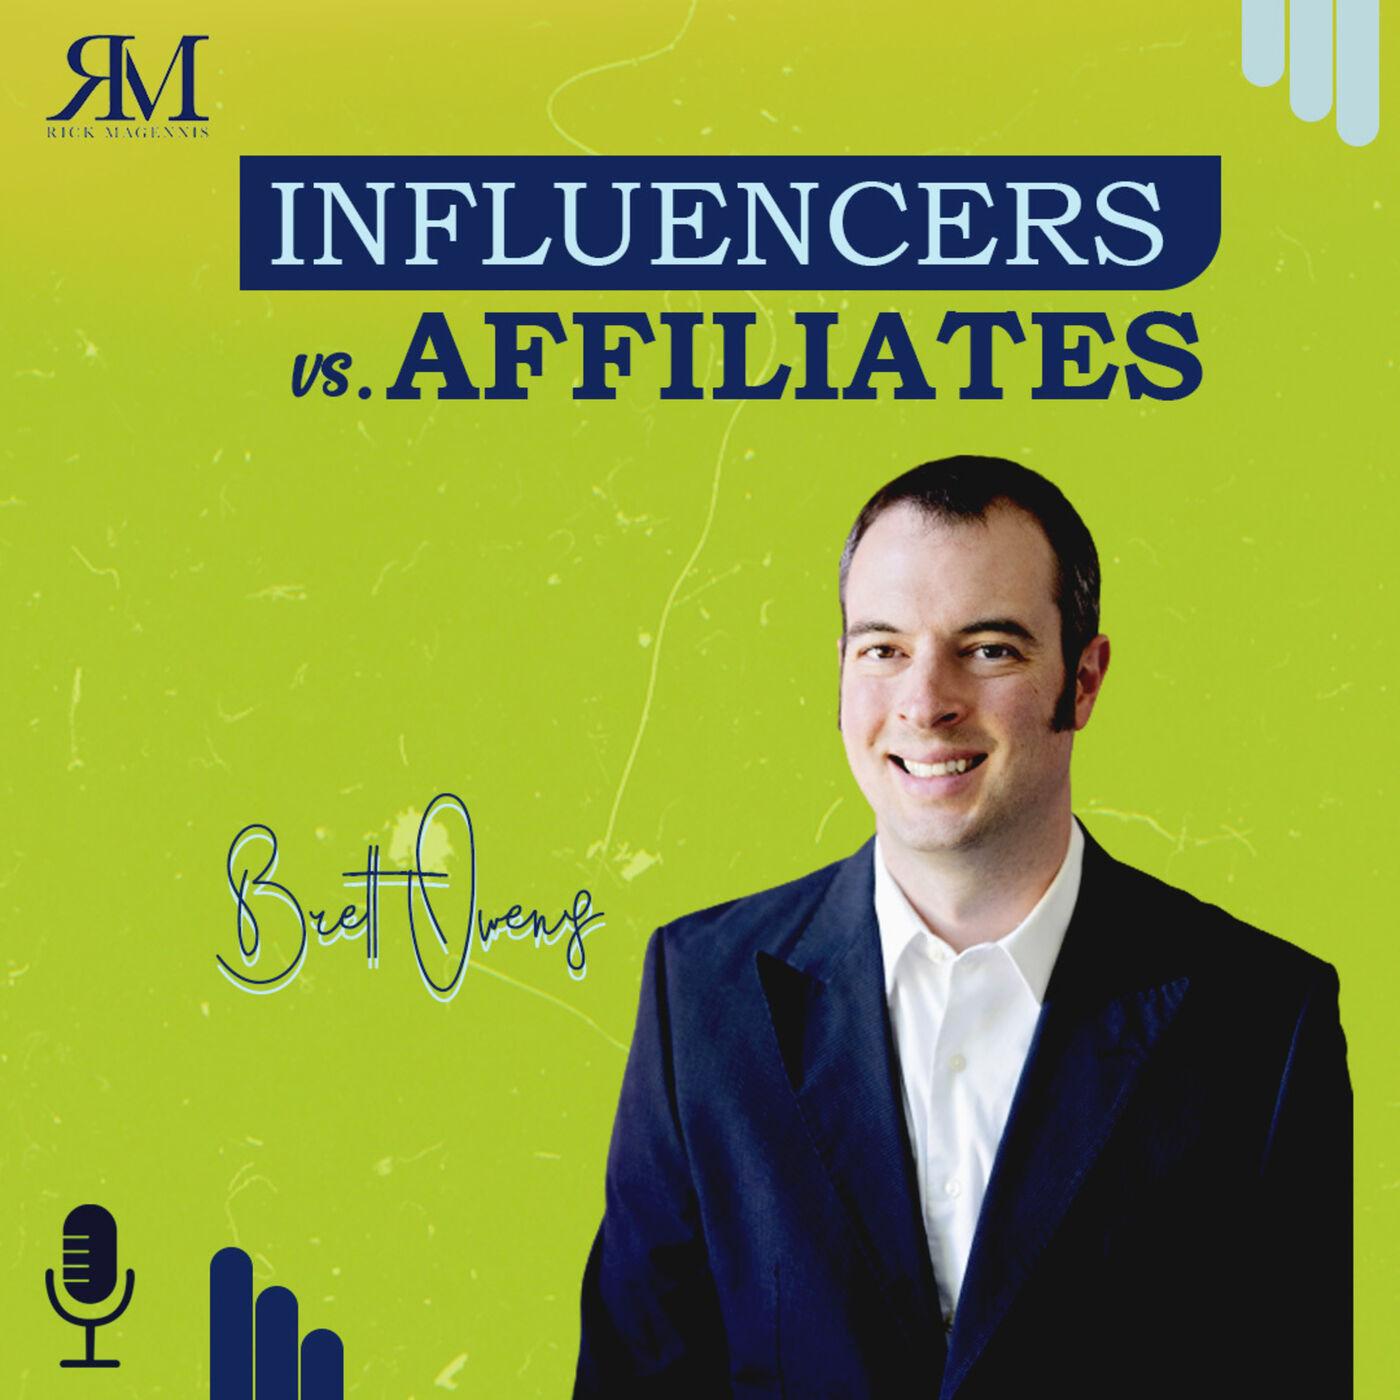 Influencers vs. Affiliates